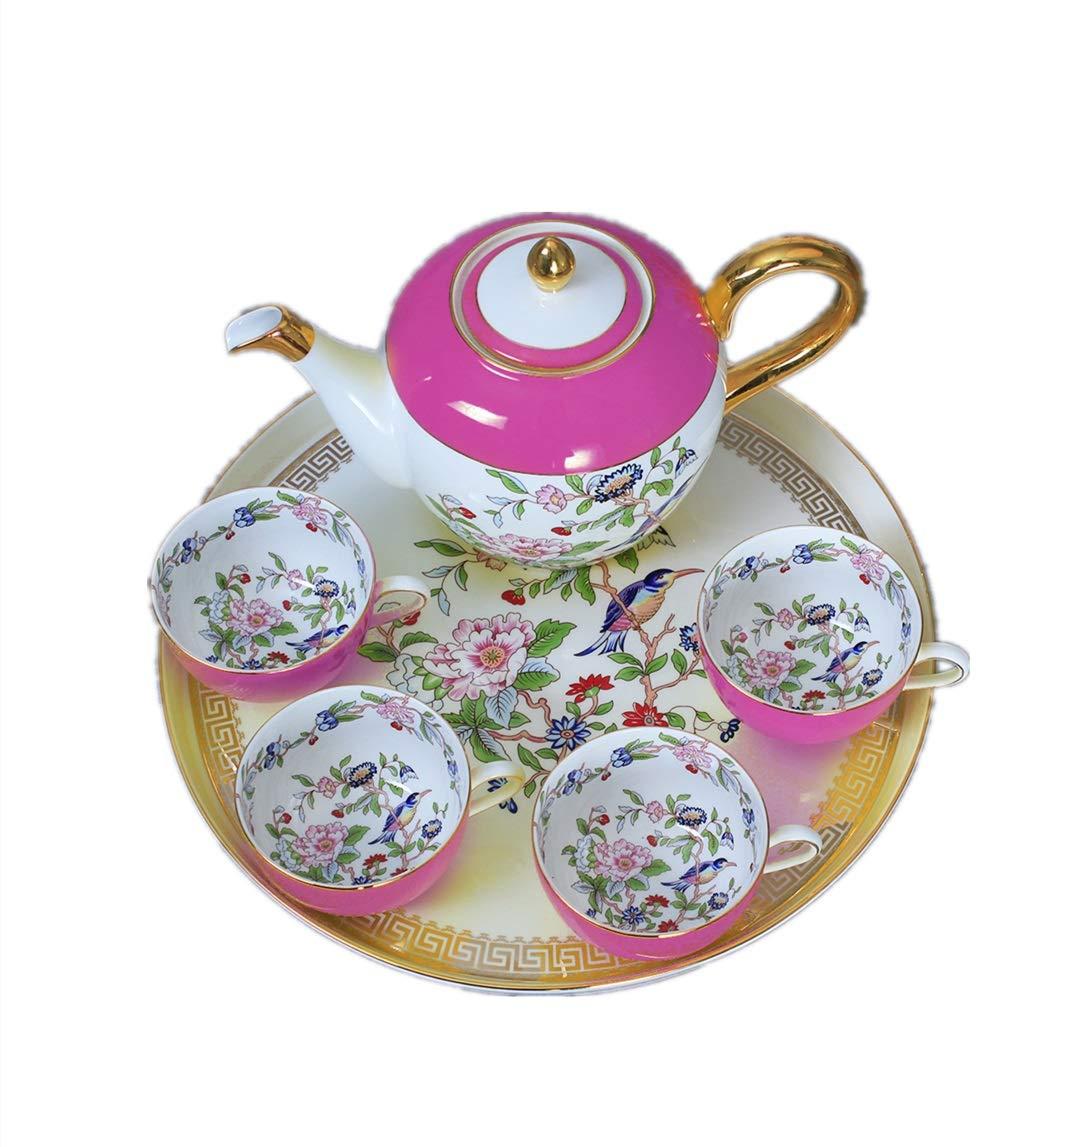 MTkxsy 審美的な陶磁器のコーヒーセットトレイ付き紅茶カップソーサーイエローカナリーコーヒーセット (Color : Red) B07QVZ1JCP Red